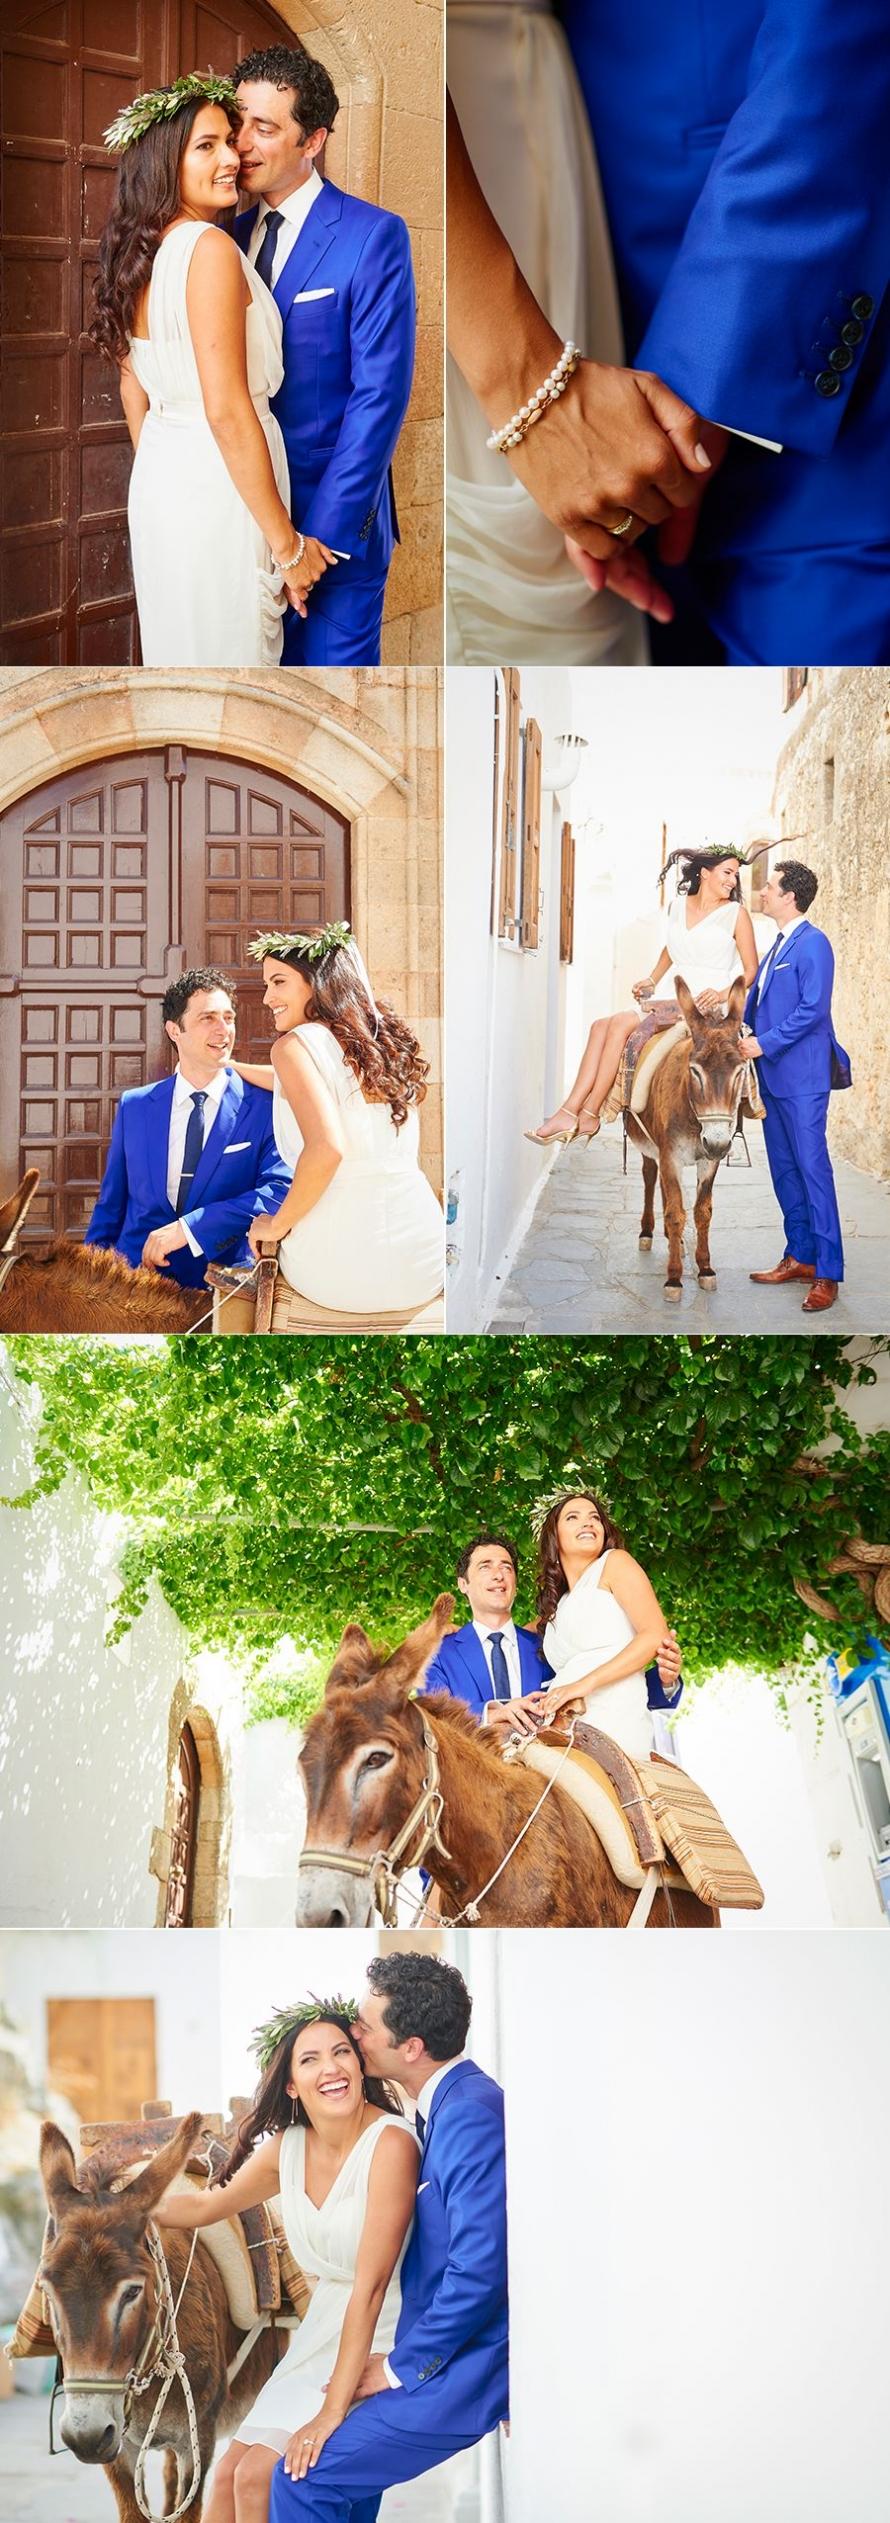 Nick Charlotte wedding 25